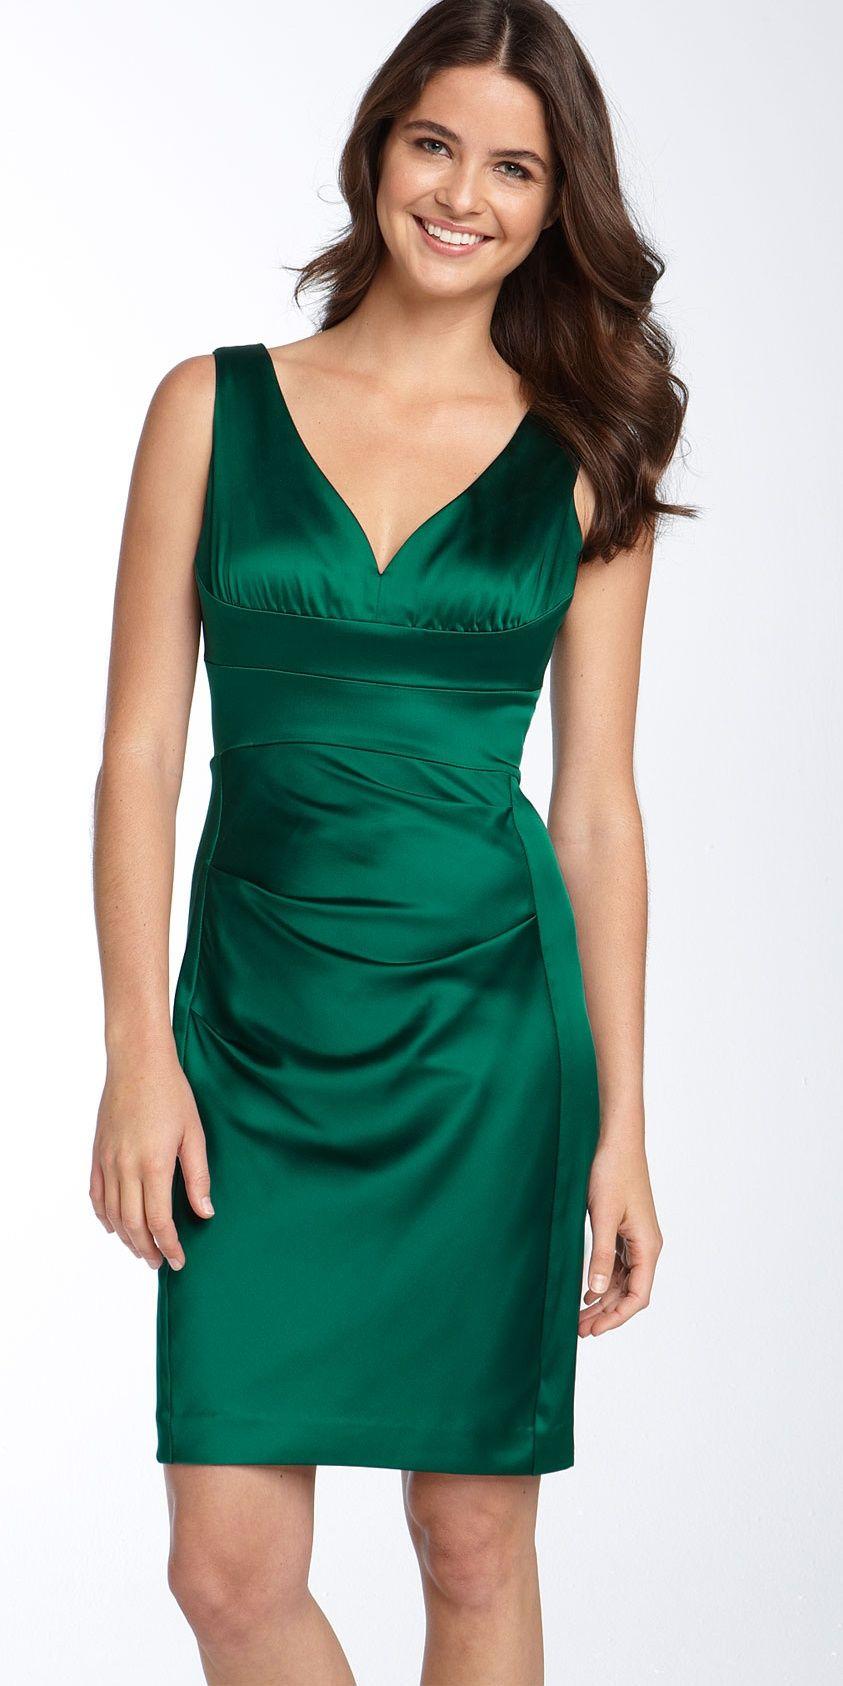 Dark Green Satin Dress   Glamorous Green Tourmaline   Pinterest ...